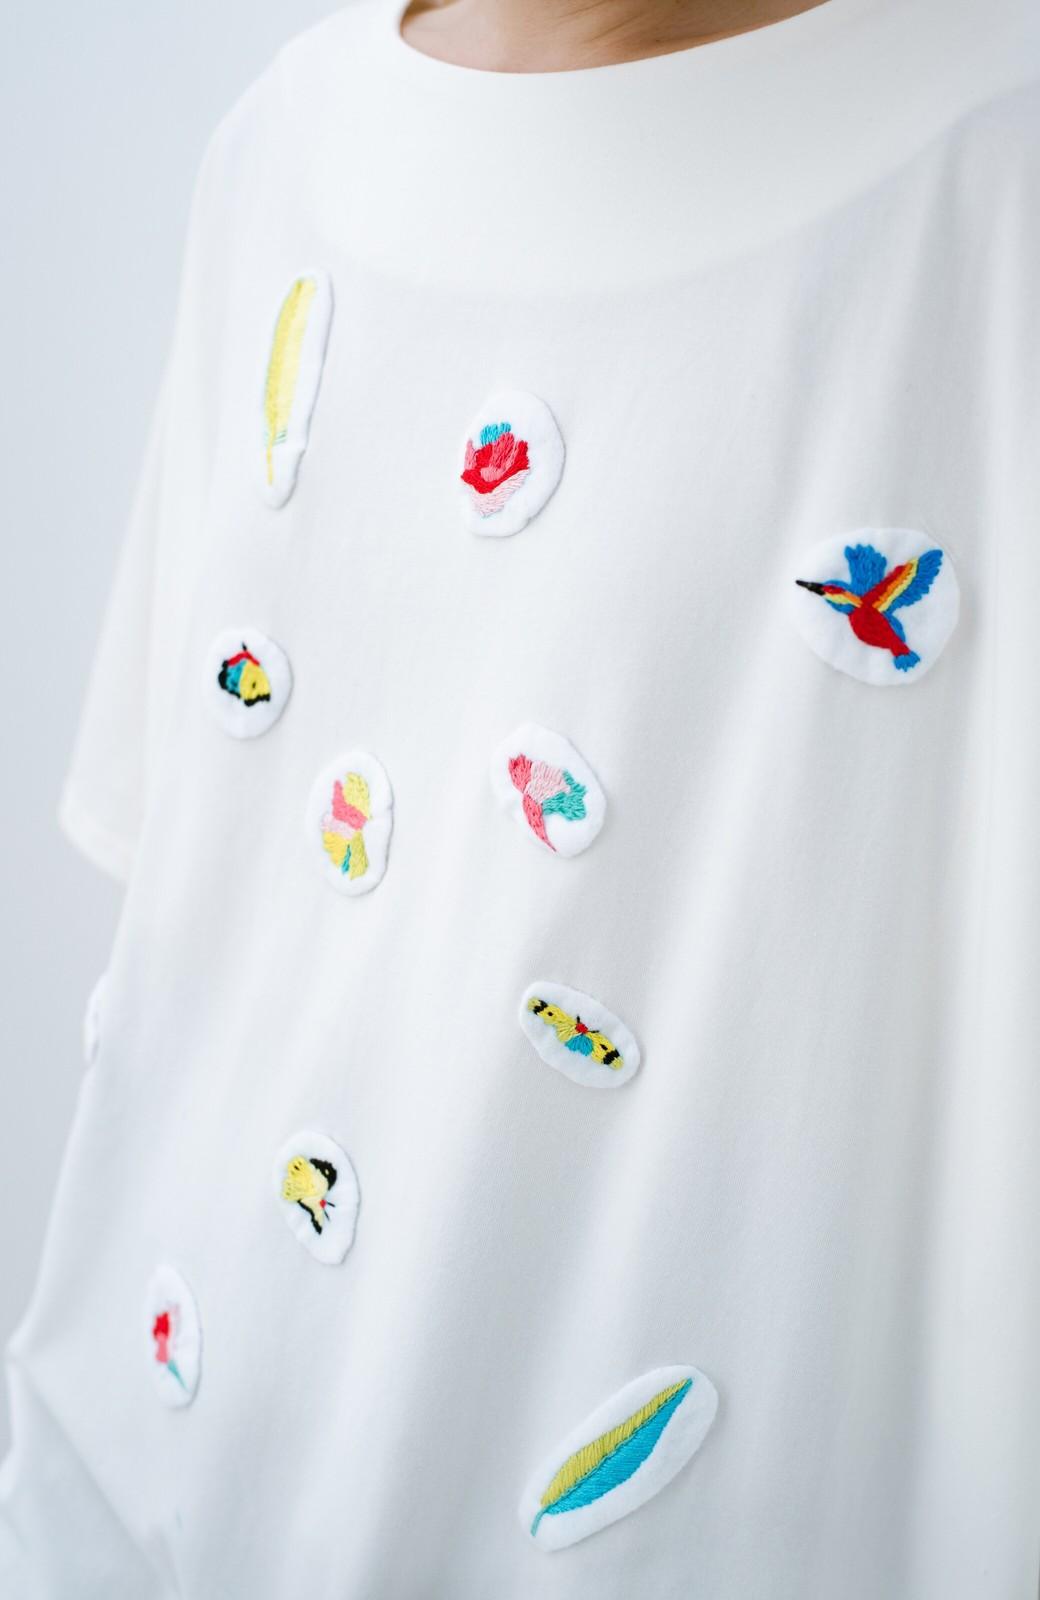 haco! Stitch by Stitch(bird) オーガニックコットンのTシャツワンピース&レギンスセット <ホワイト>の商品写真4